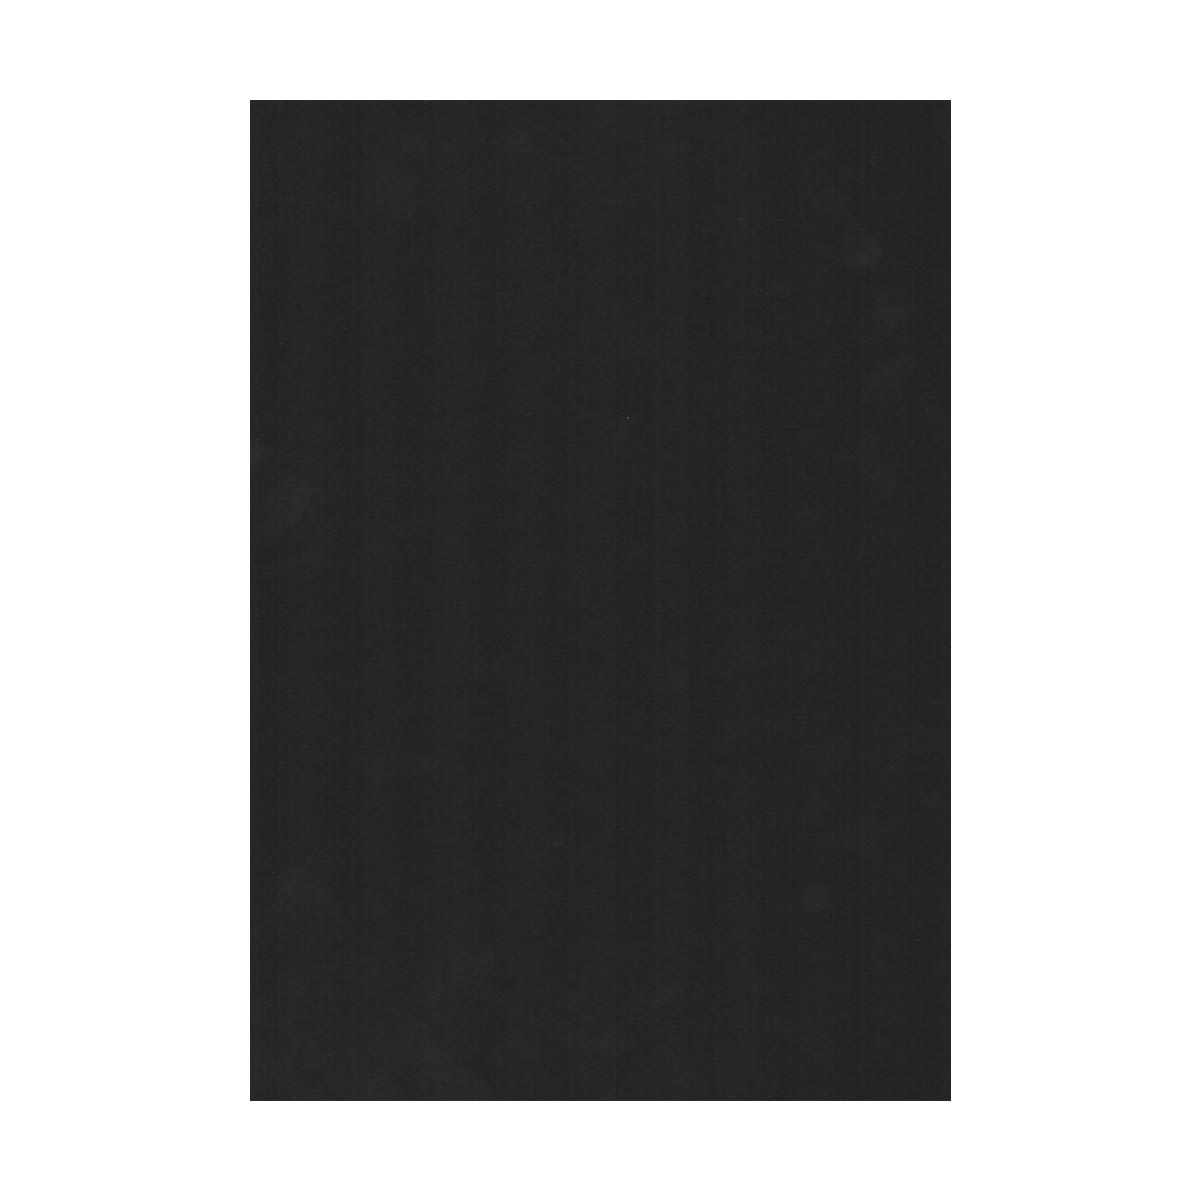 A4 OLD SCHOOL BLACK PAPER 120GSM